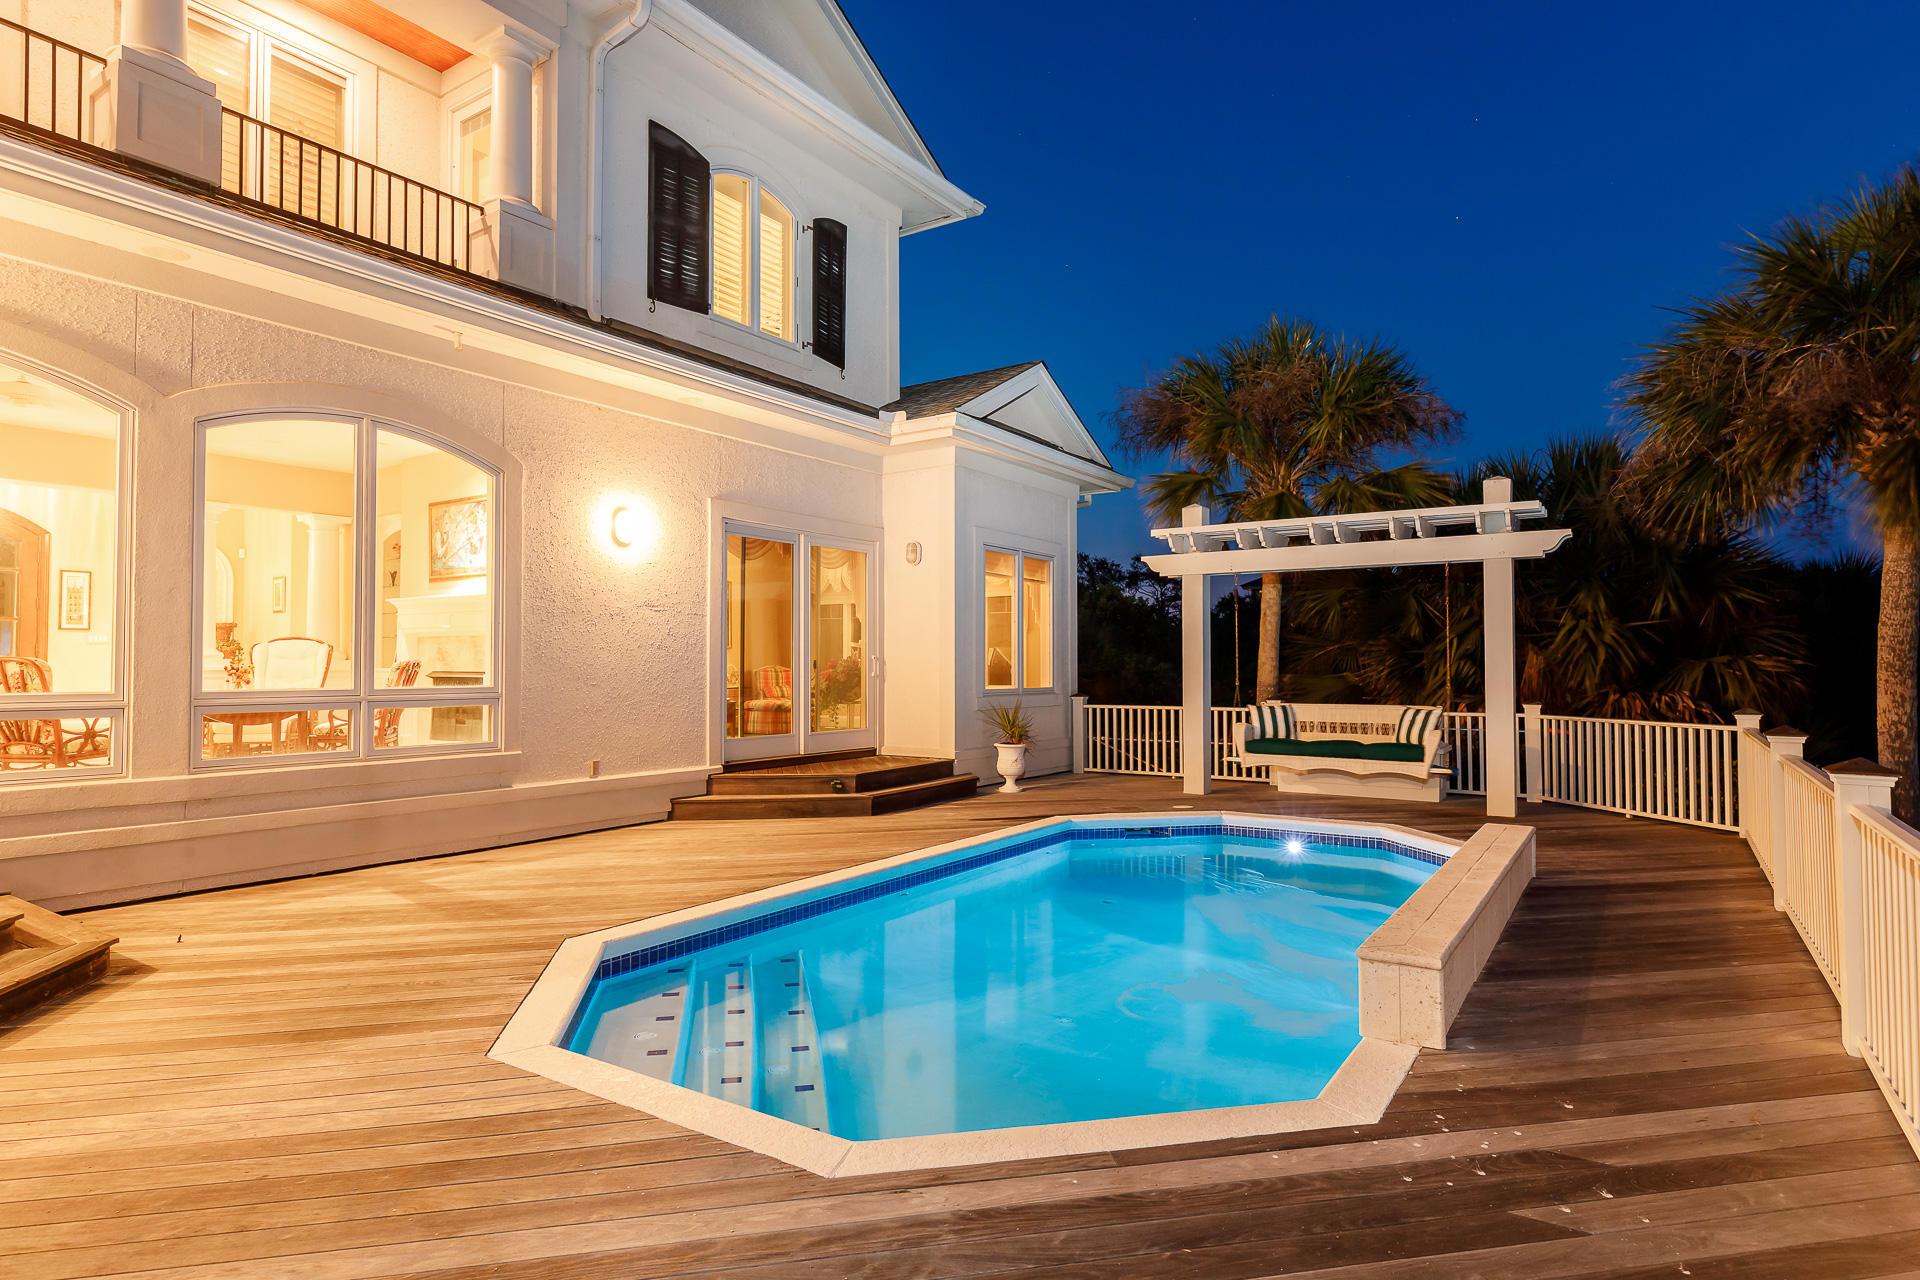 Seabrook Island Homes For Sale - 2216 Rolling Dune, Seabrook Island, SC - 62